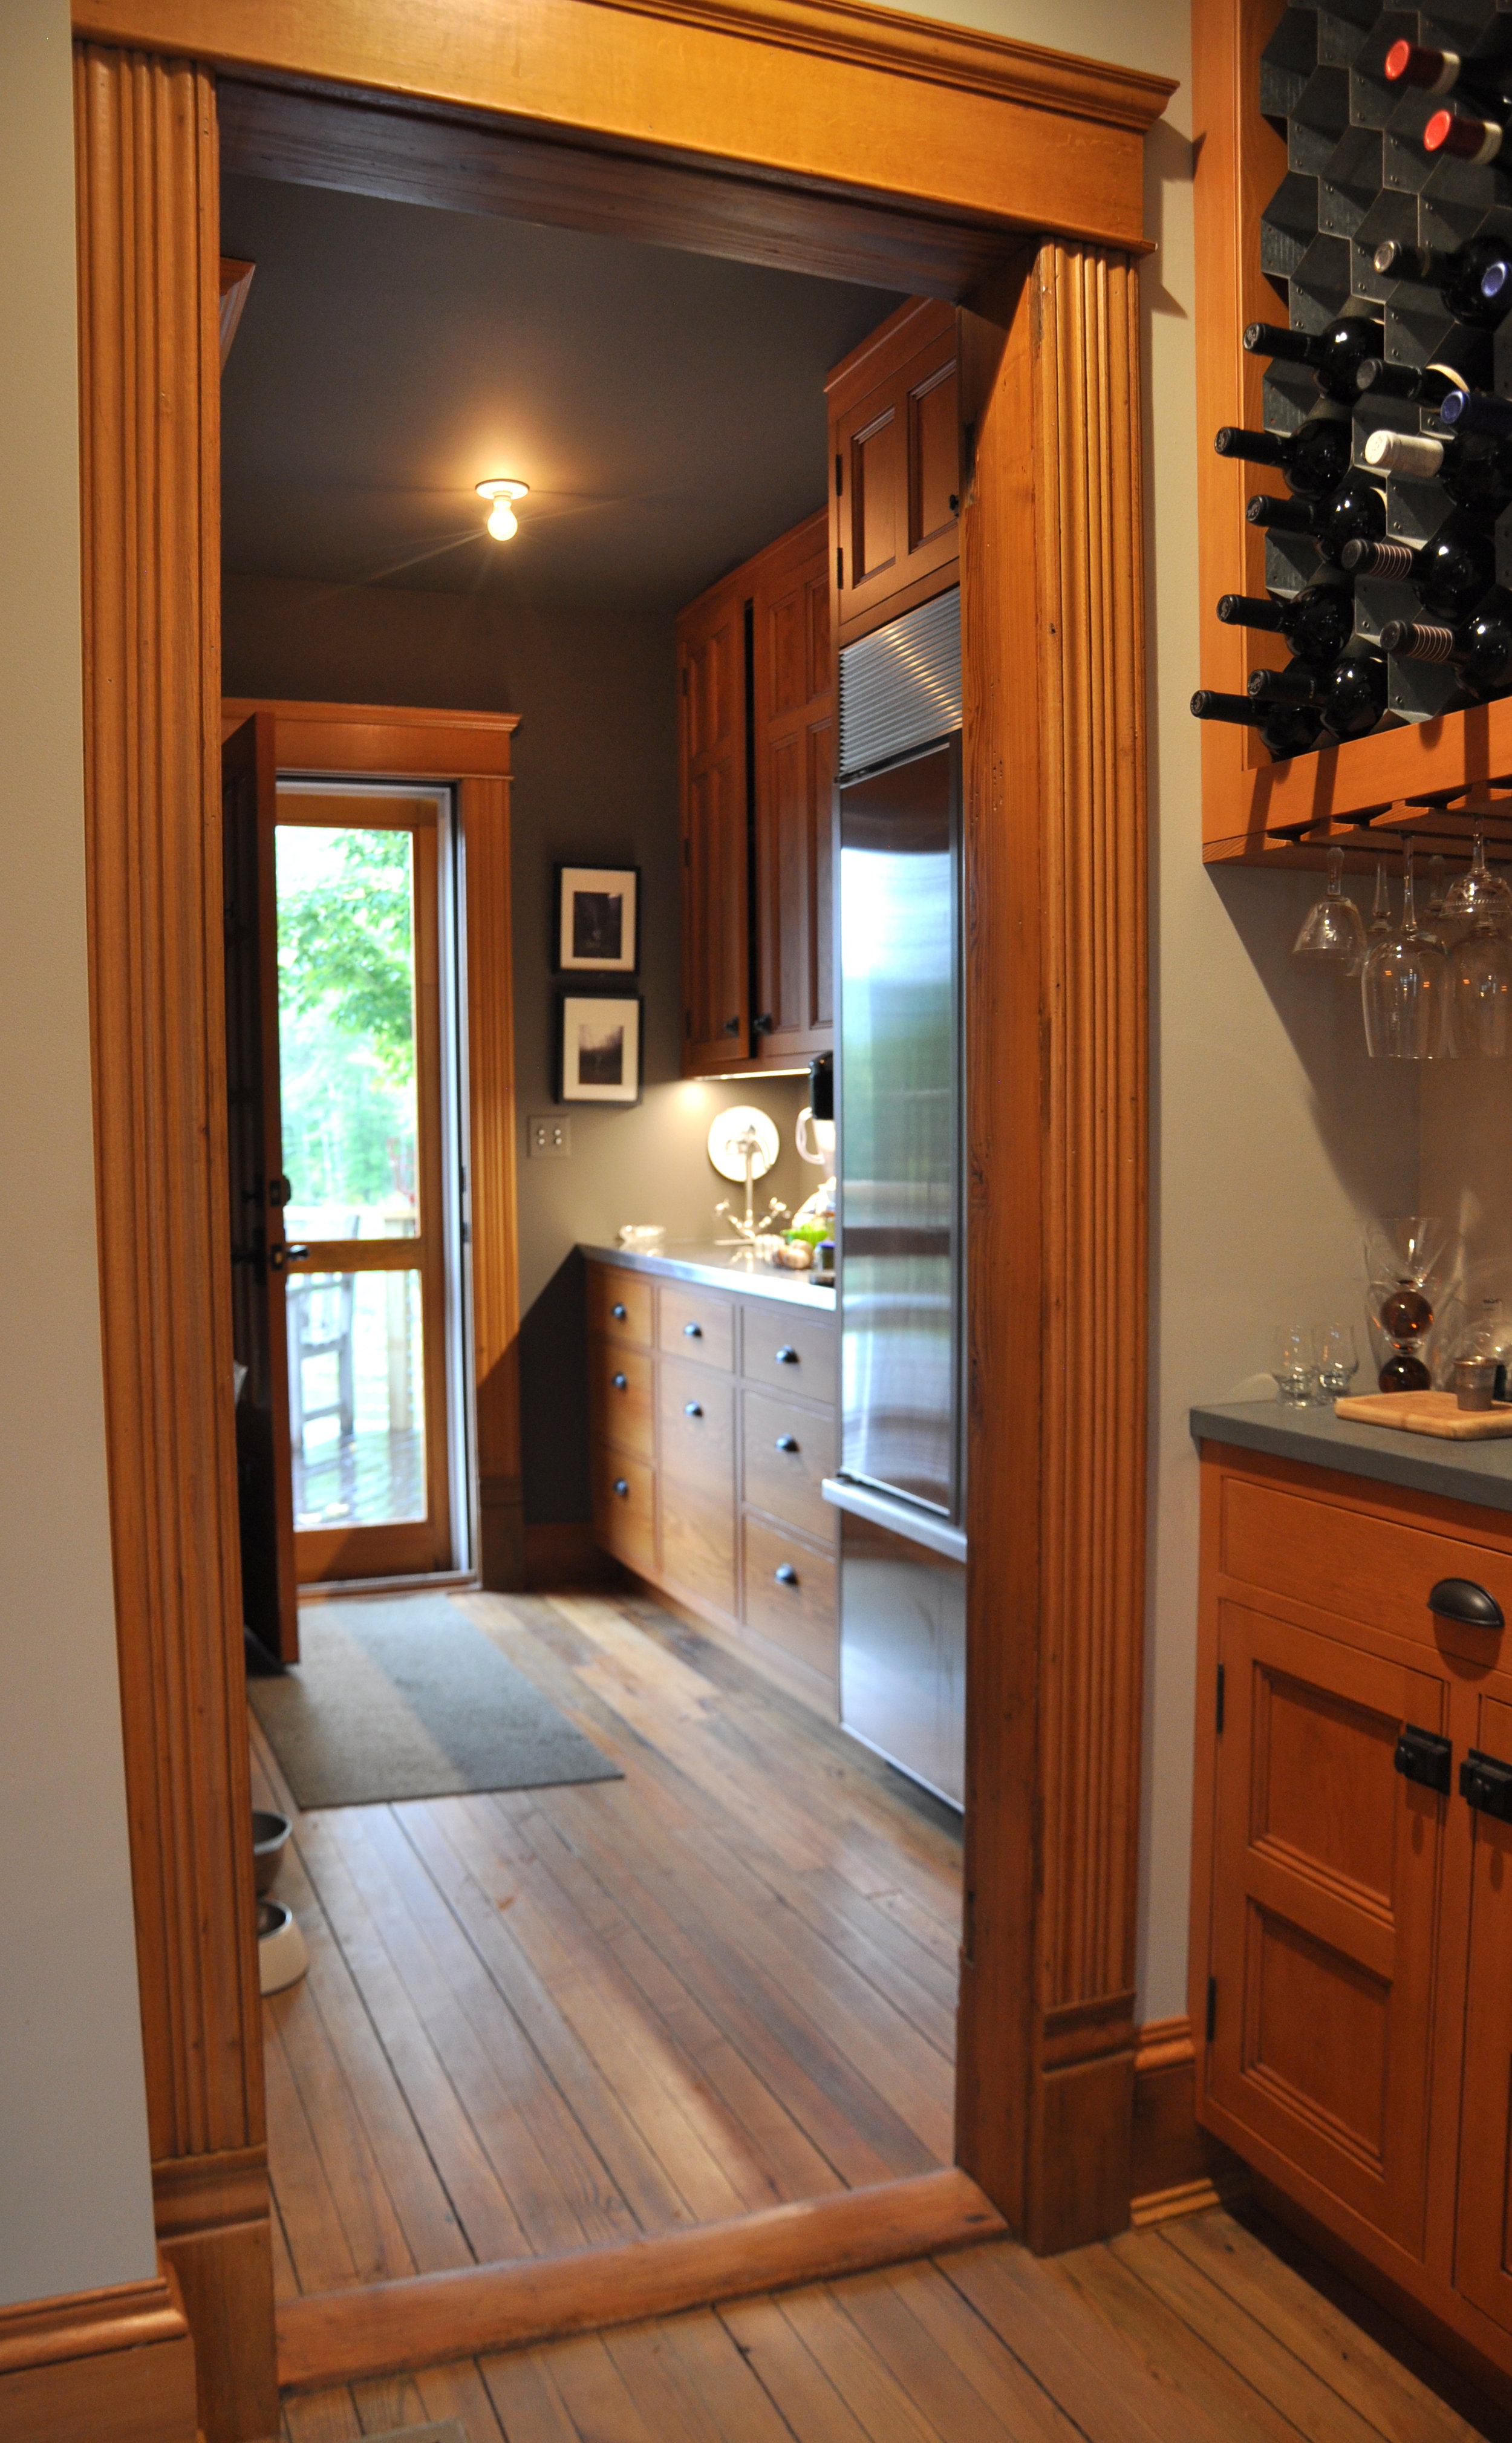 modernized rural farmhouse, residential renovation, open plan, new kitchen, new interior finishes, bar, wine storage, pantry, back door, porch, deck